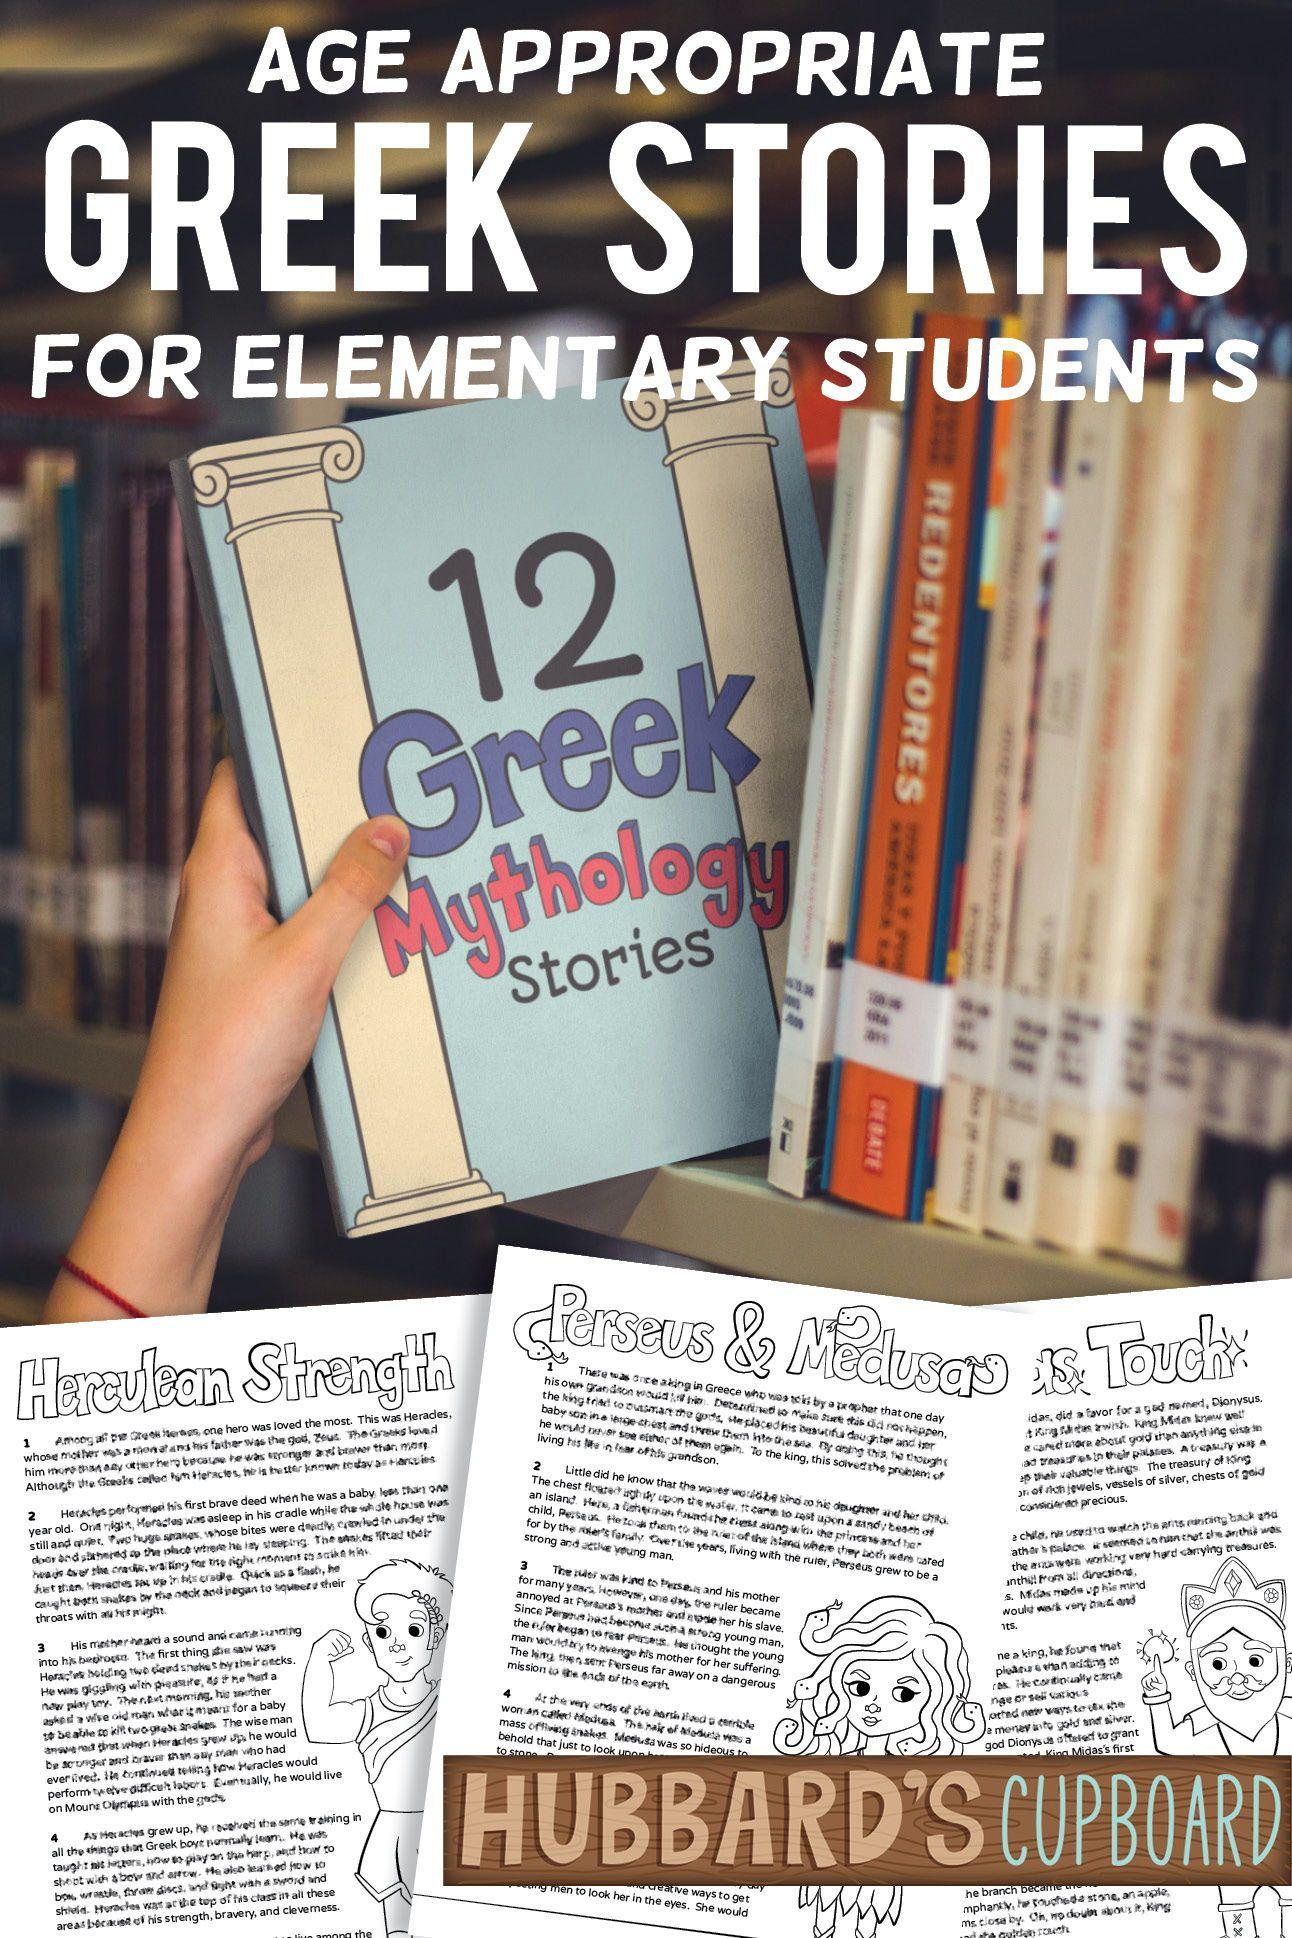 Greek Mythology Stories 4th 6th Greek Myths Upper Elementary Reading In 2020 Greek Mythology Stories Greek Myths Upper Elementary Reading